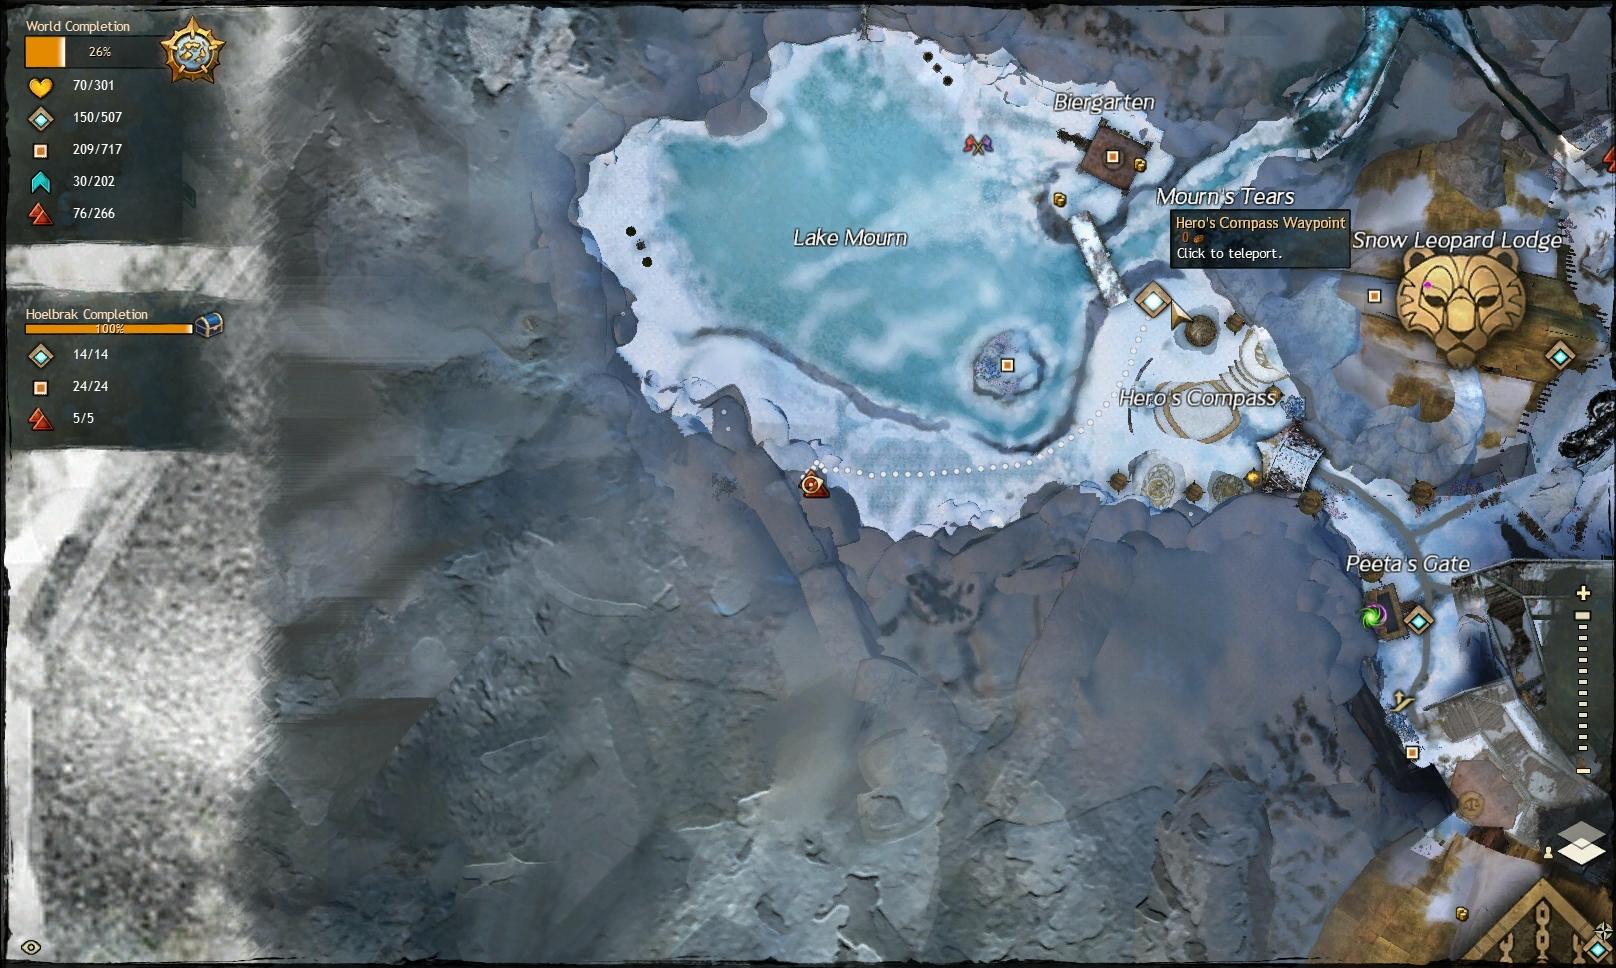 Guild Wars 2 - Vistas in Hoelbrak - 03 Lake Mourn